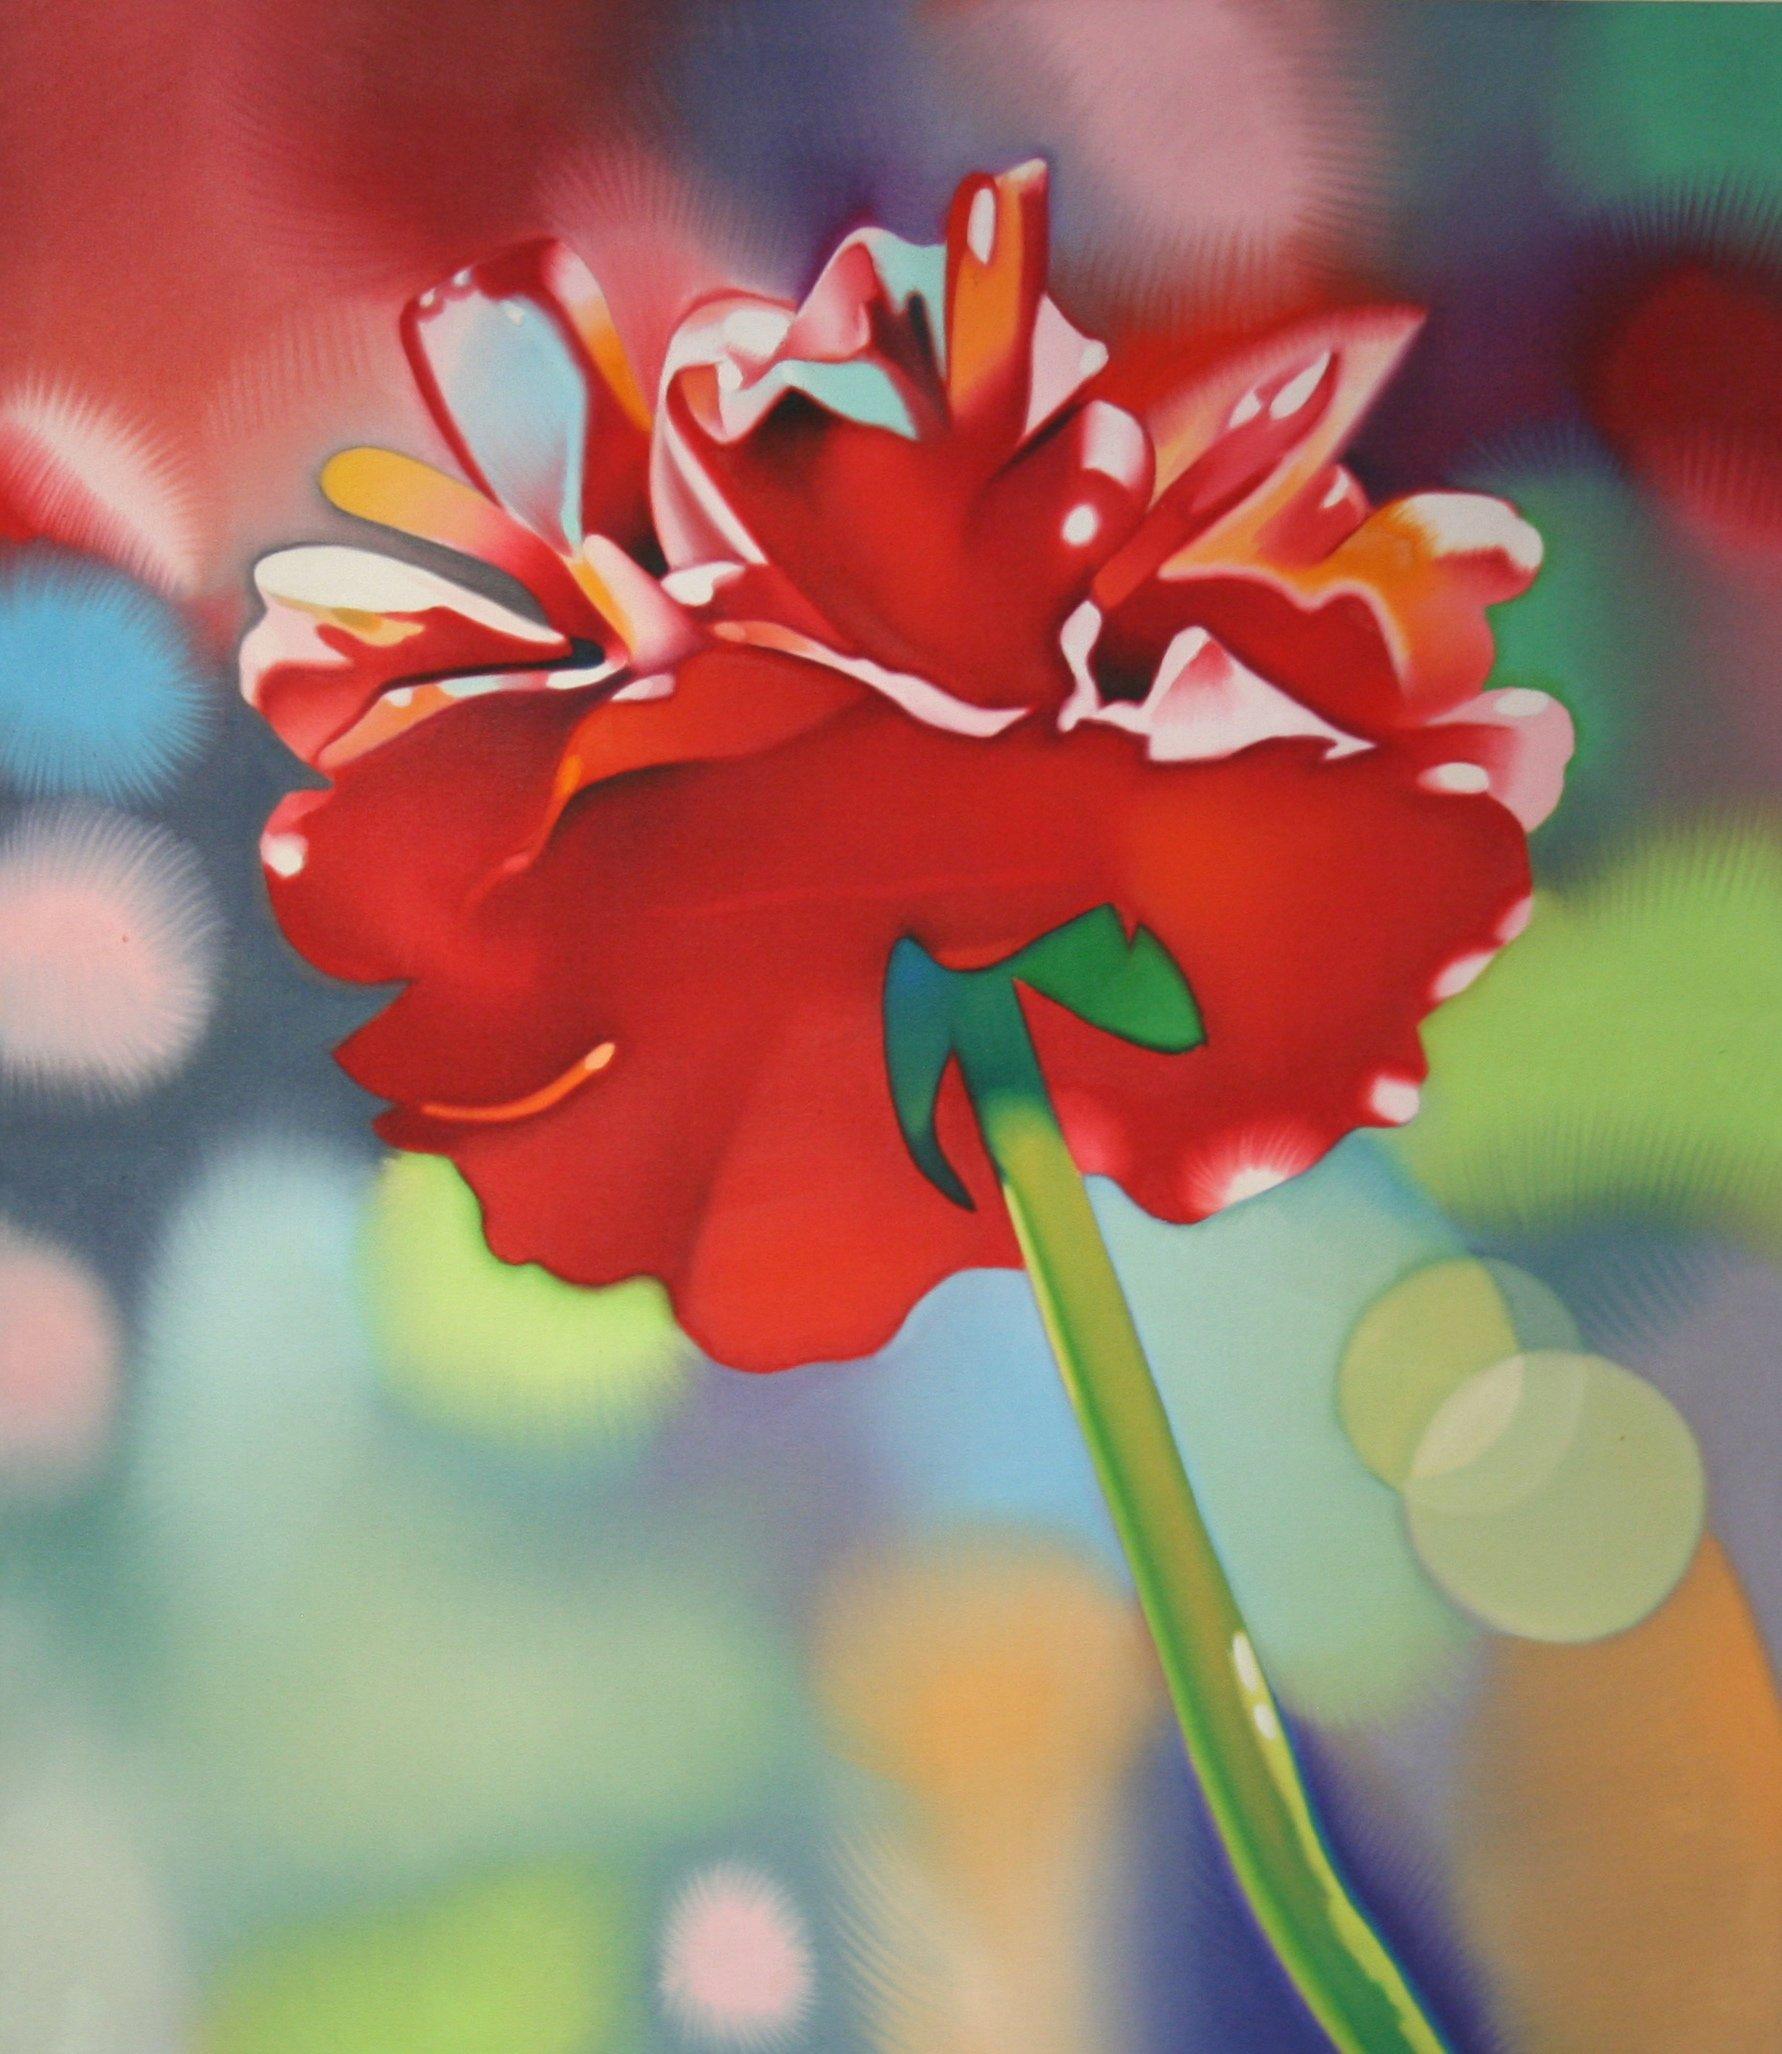 Pruner, Gary – Untitled Red Flower